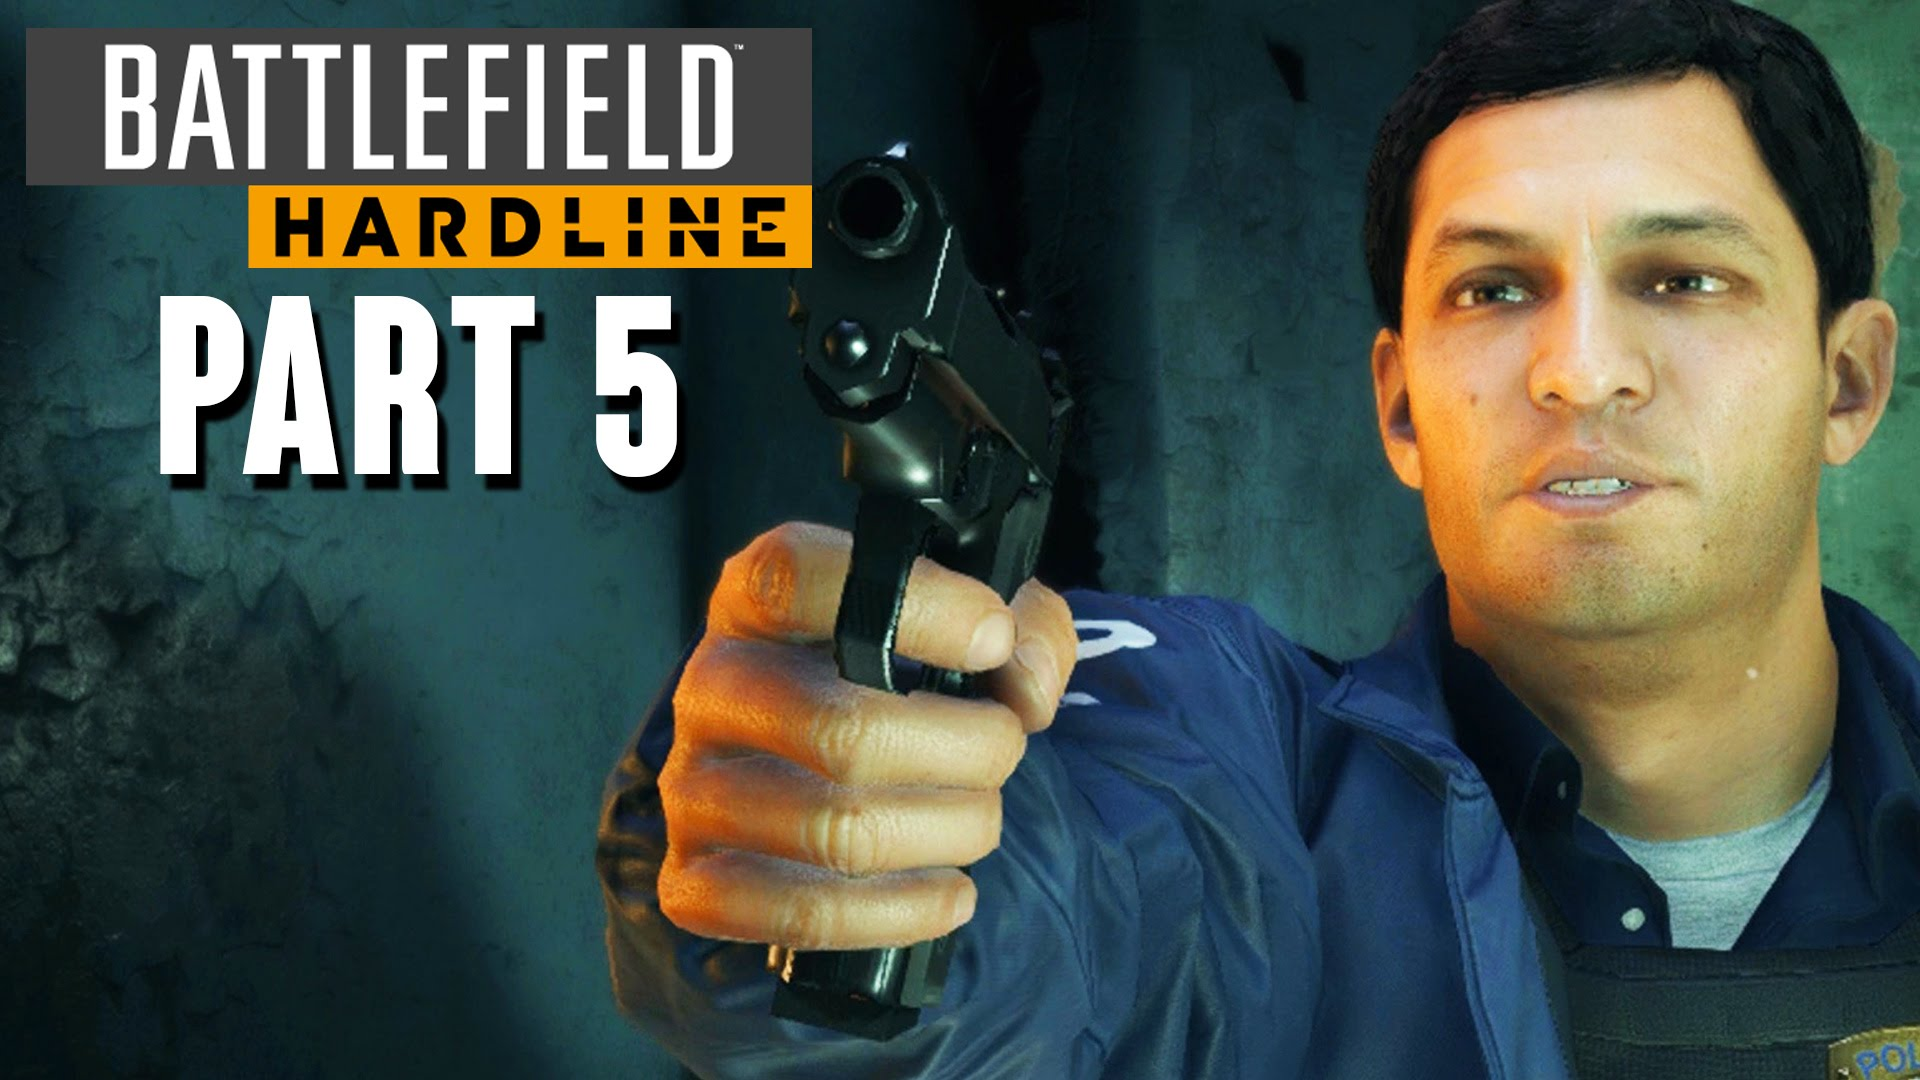 بتلفیلد هاردلاین مرحله5 - Battlefield Hardline-PC Part5